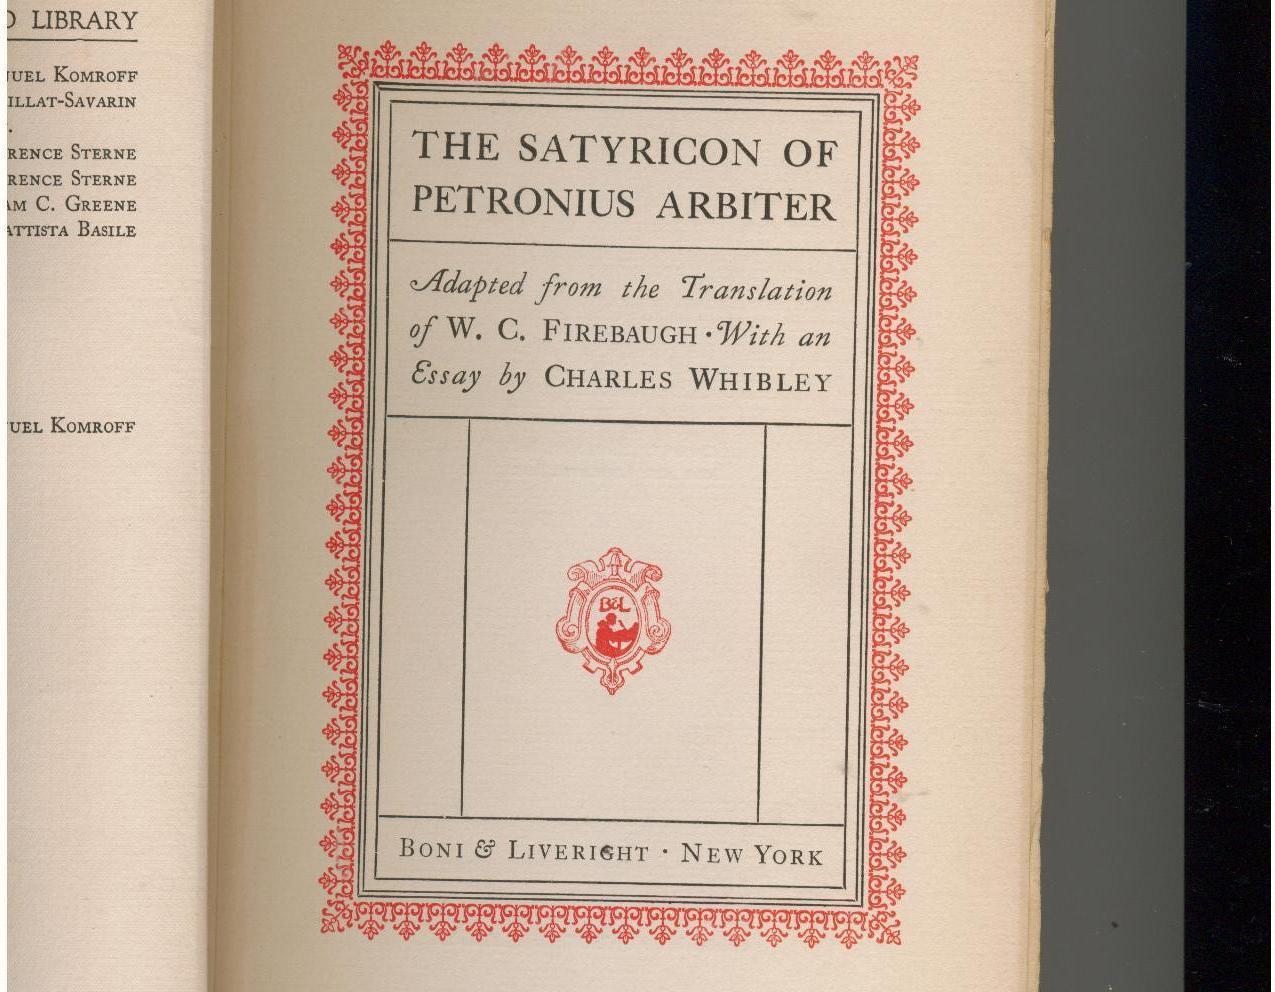 SATYRICON OF PETRONIUS ARBITER  1927  1st Trade Edition